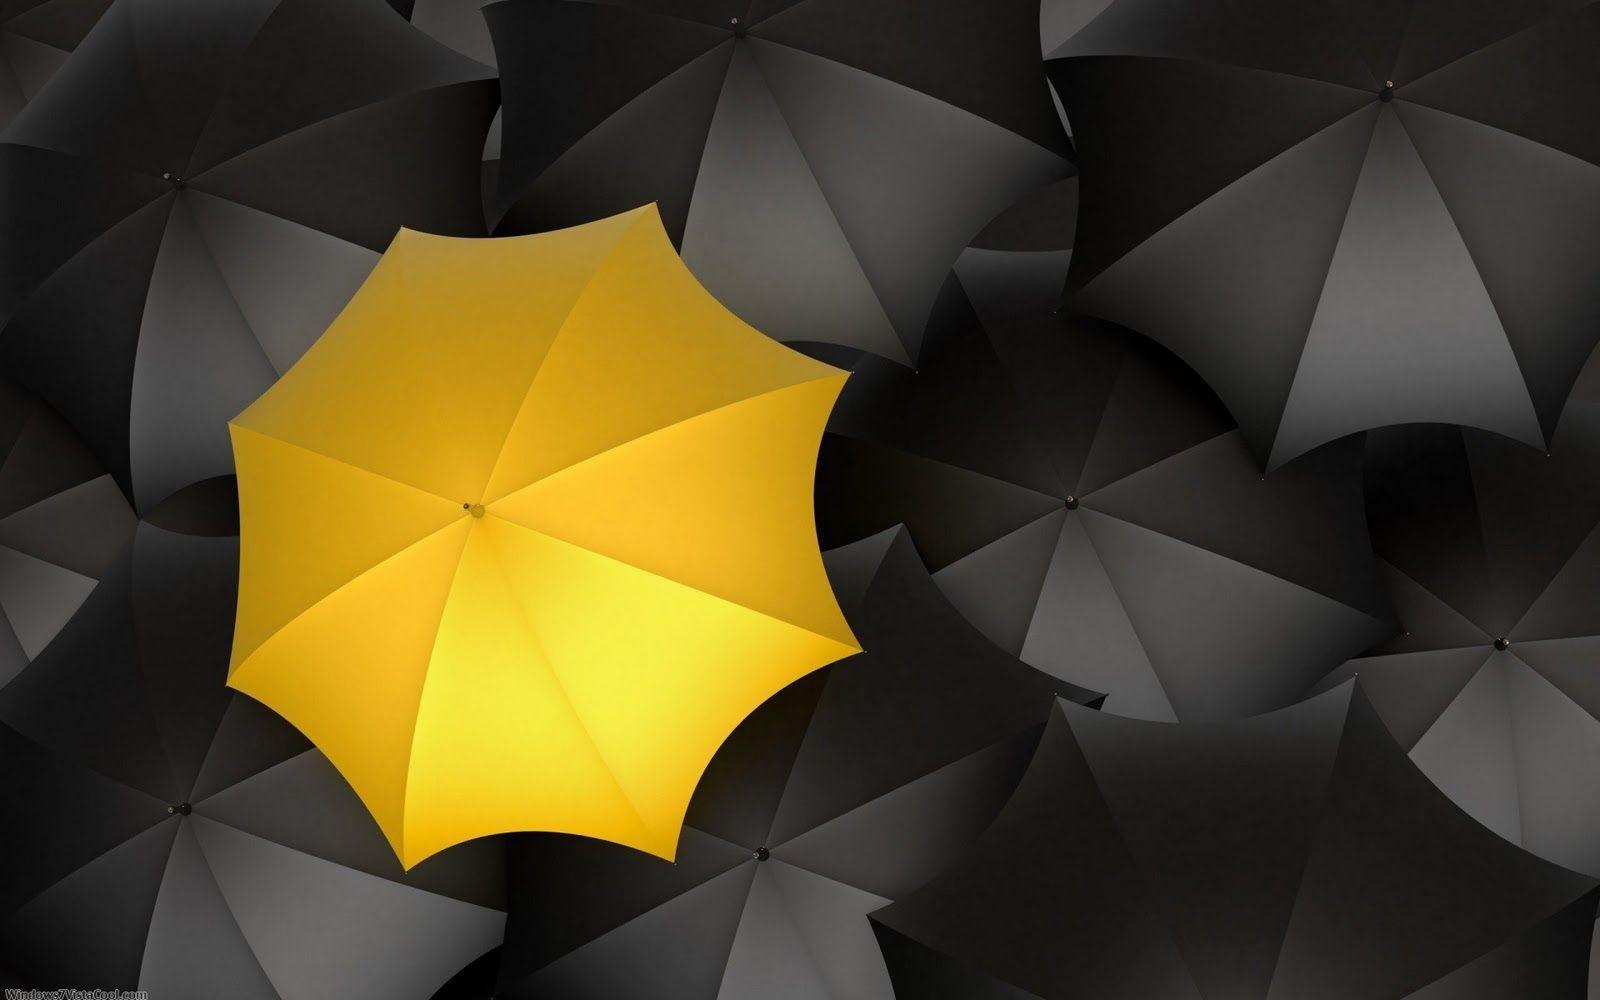 Yellow Umbrella Wallpapers Top Free Yellow Umbrella Backgrounds